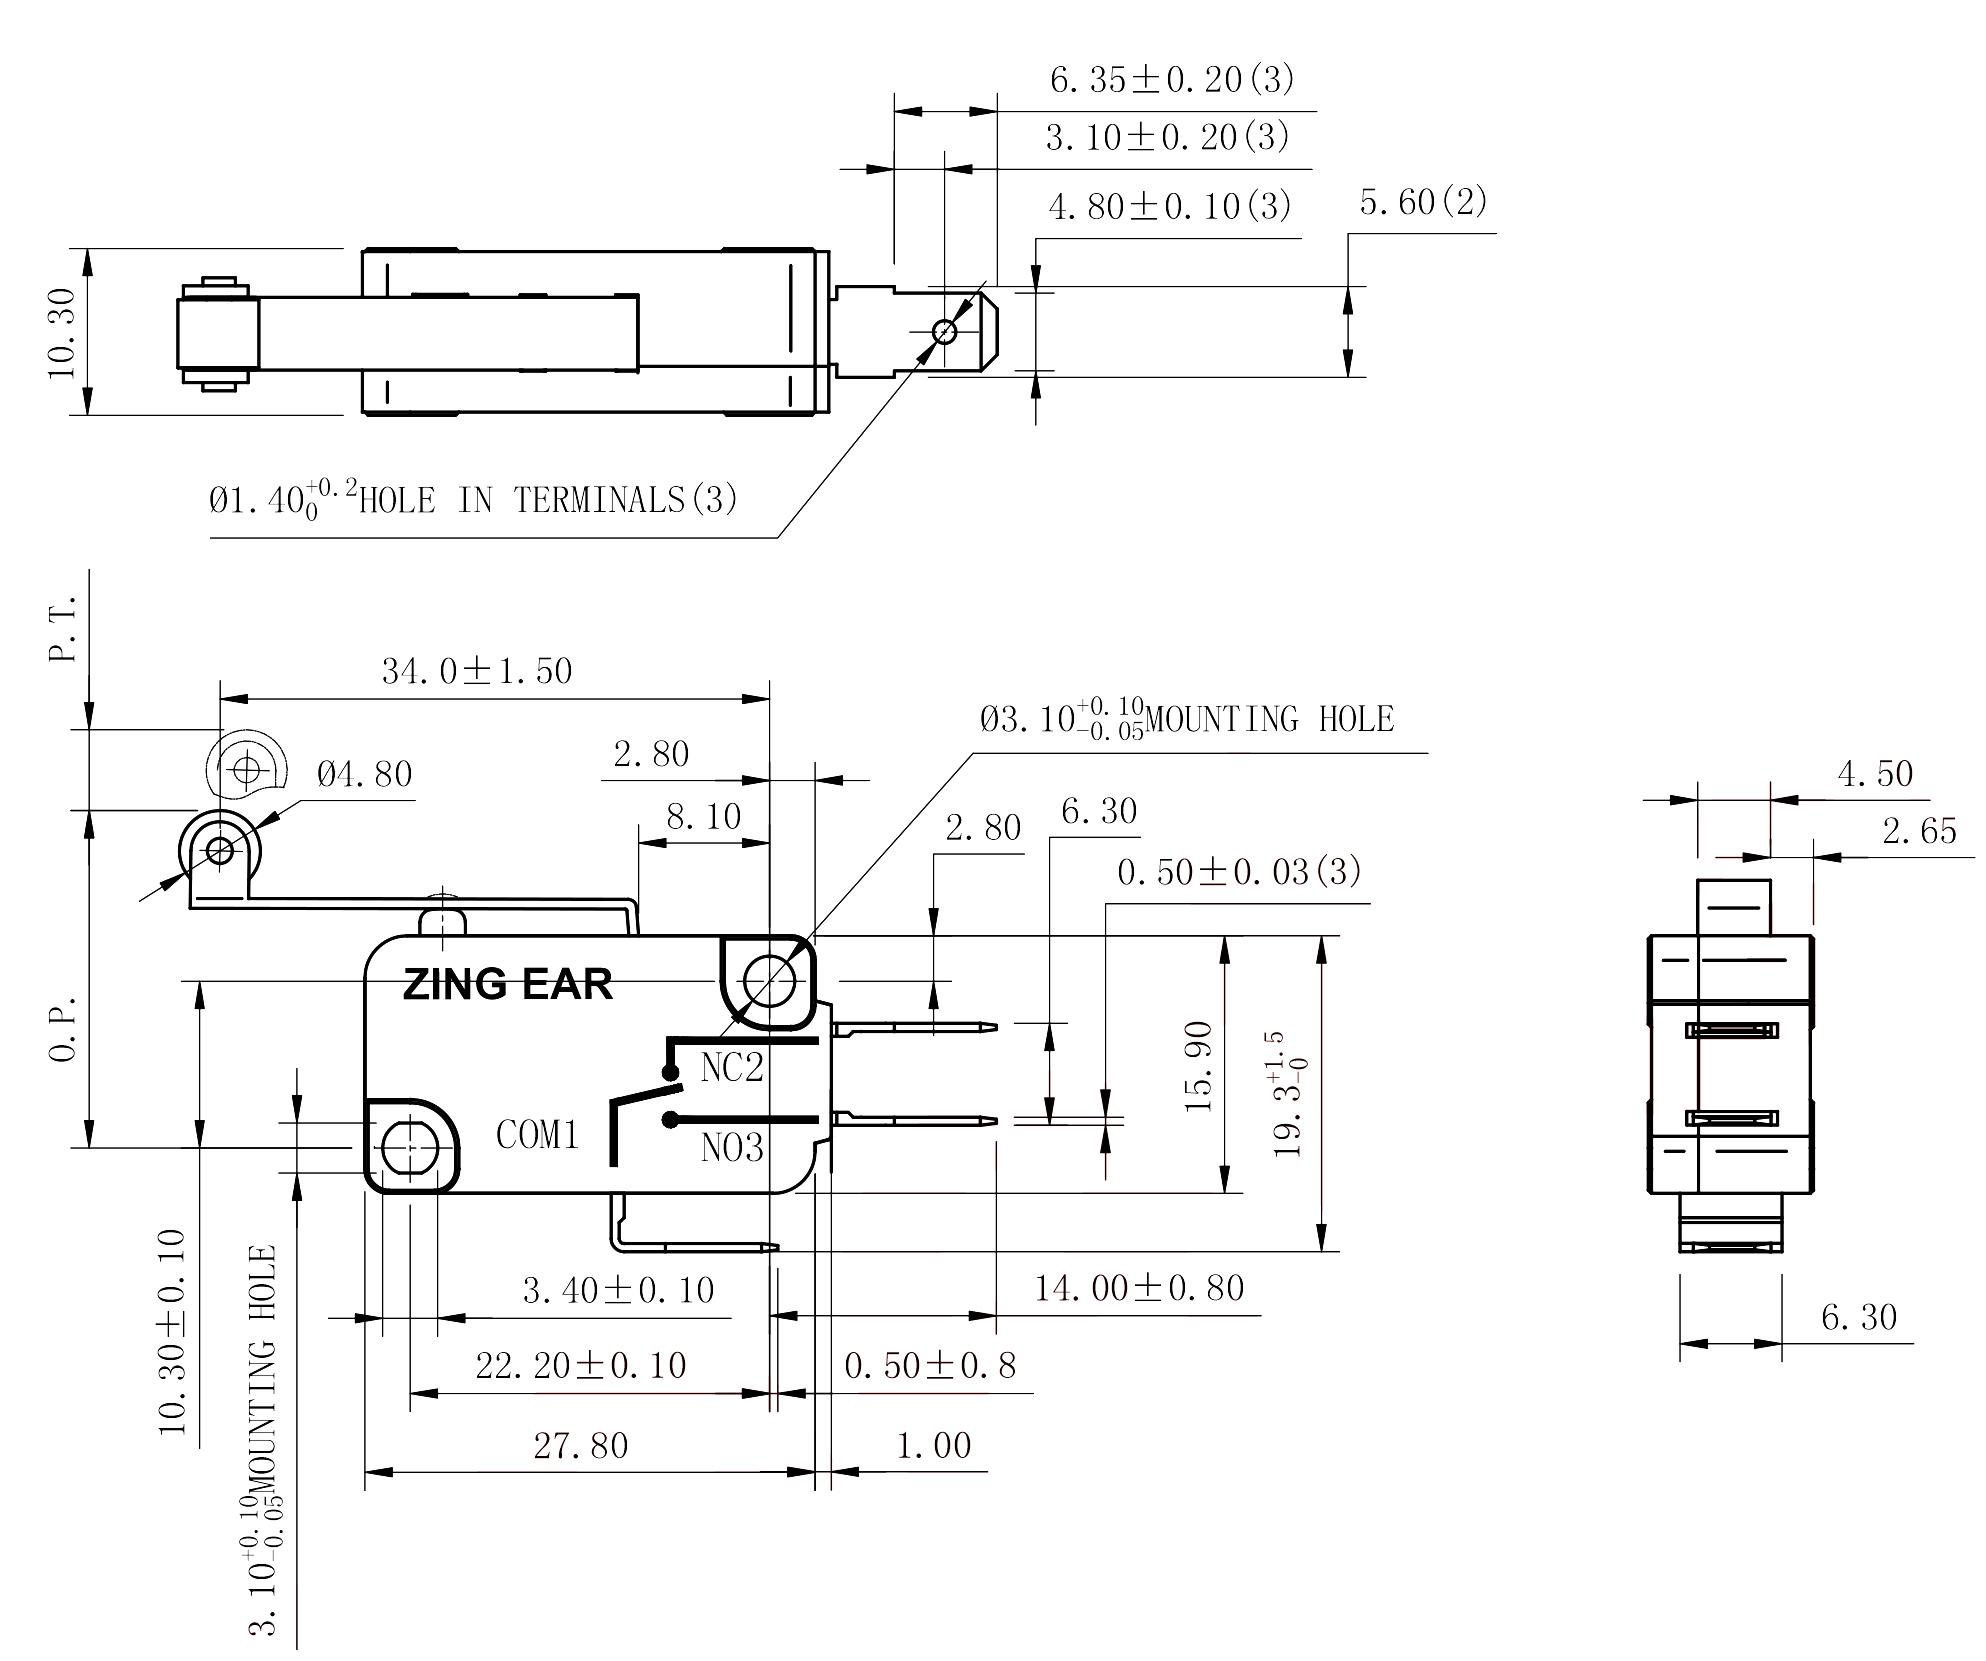 Drawing_G5T16-E1Z200A114-623_Rev_A0